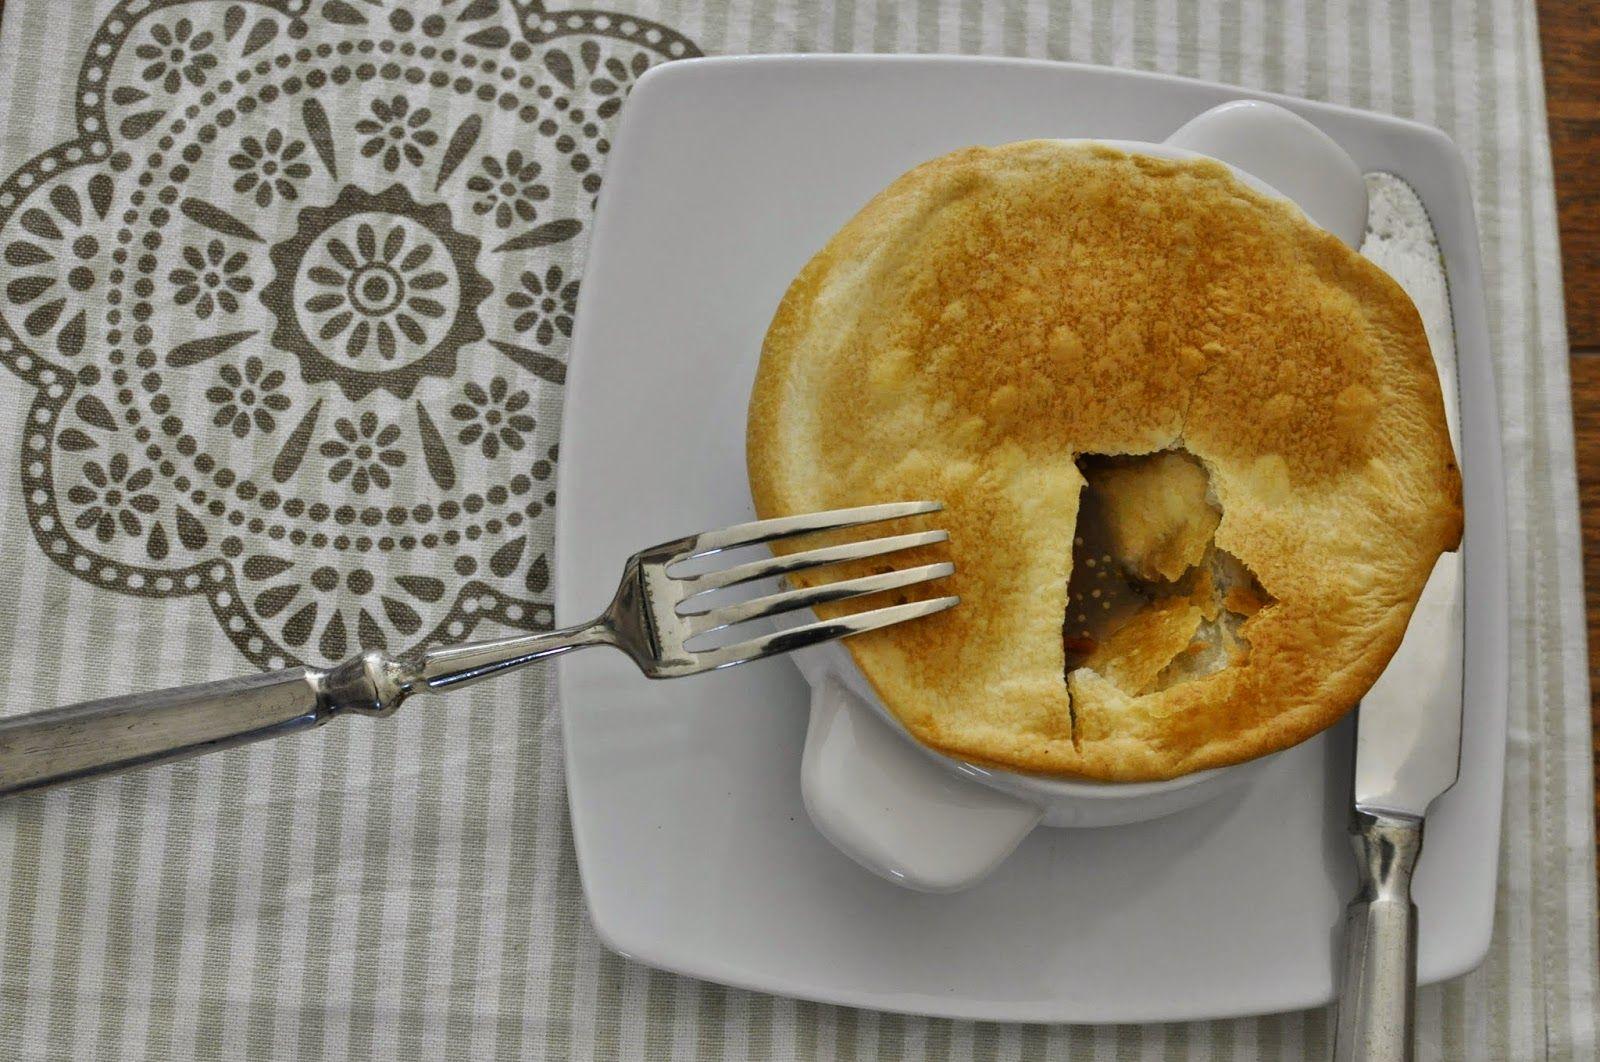 POLIN EN LA COCINA: Pie de carne | Cocina diaria | Pinterest | Carne ...